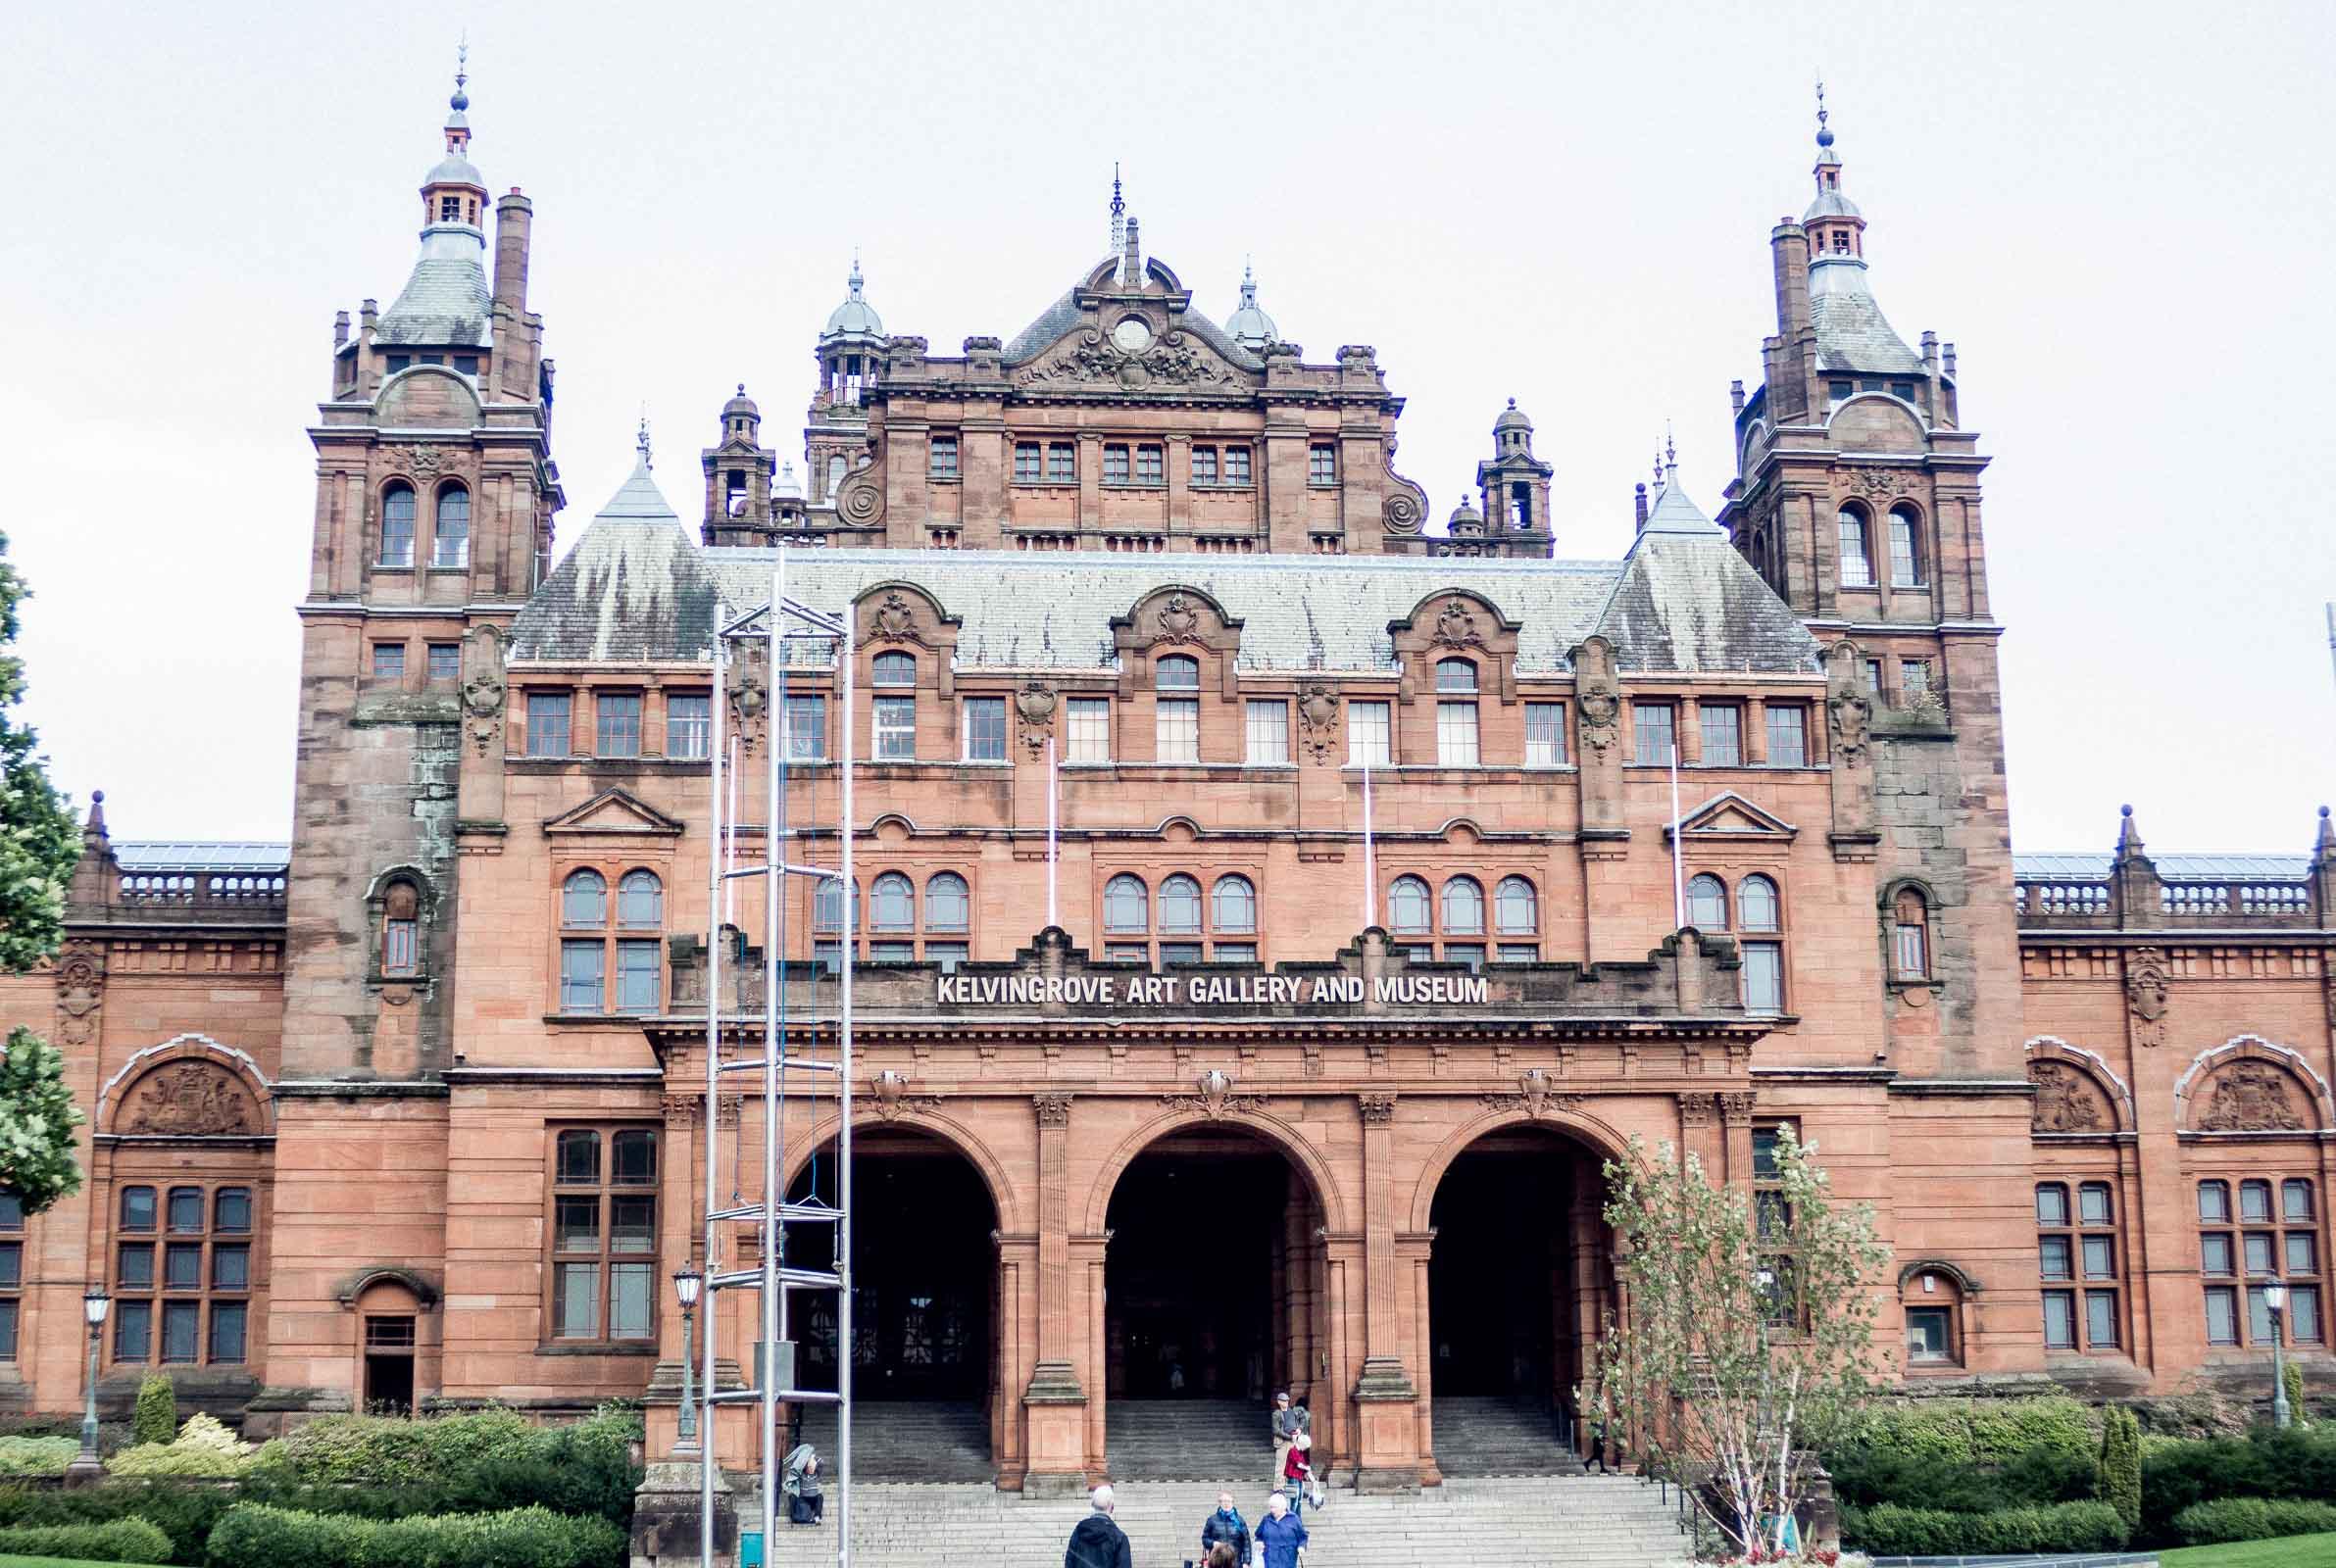 City Guide: Off Duty in Glasgow - Kelvinsgrove Art Galleries